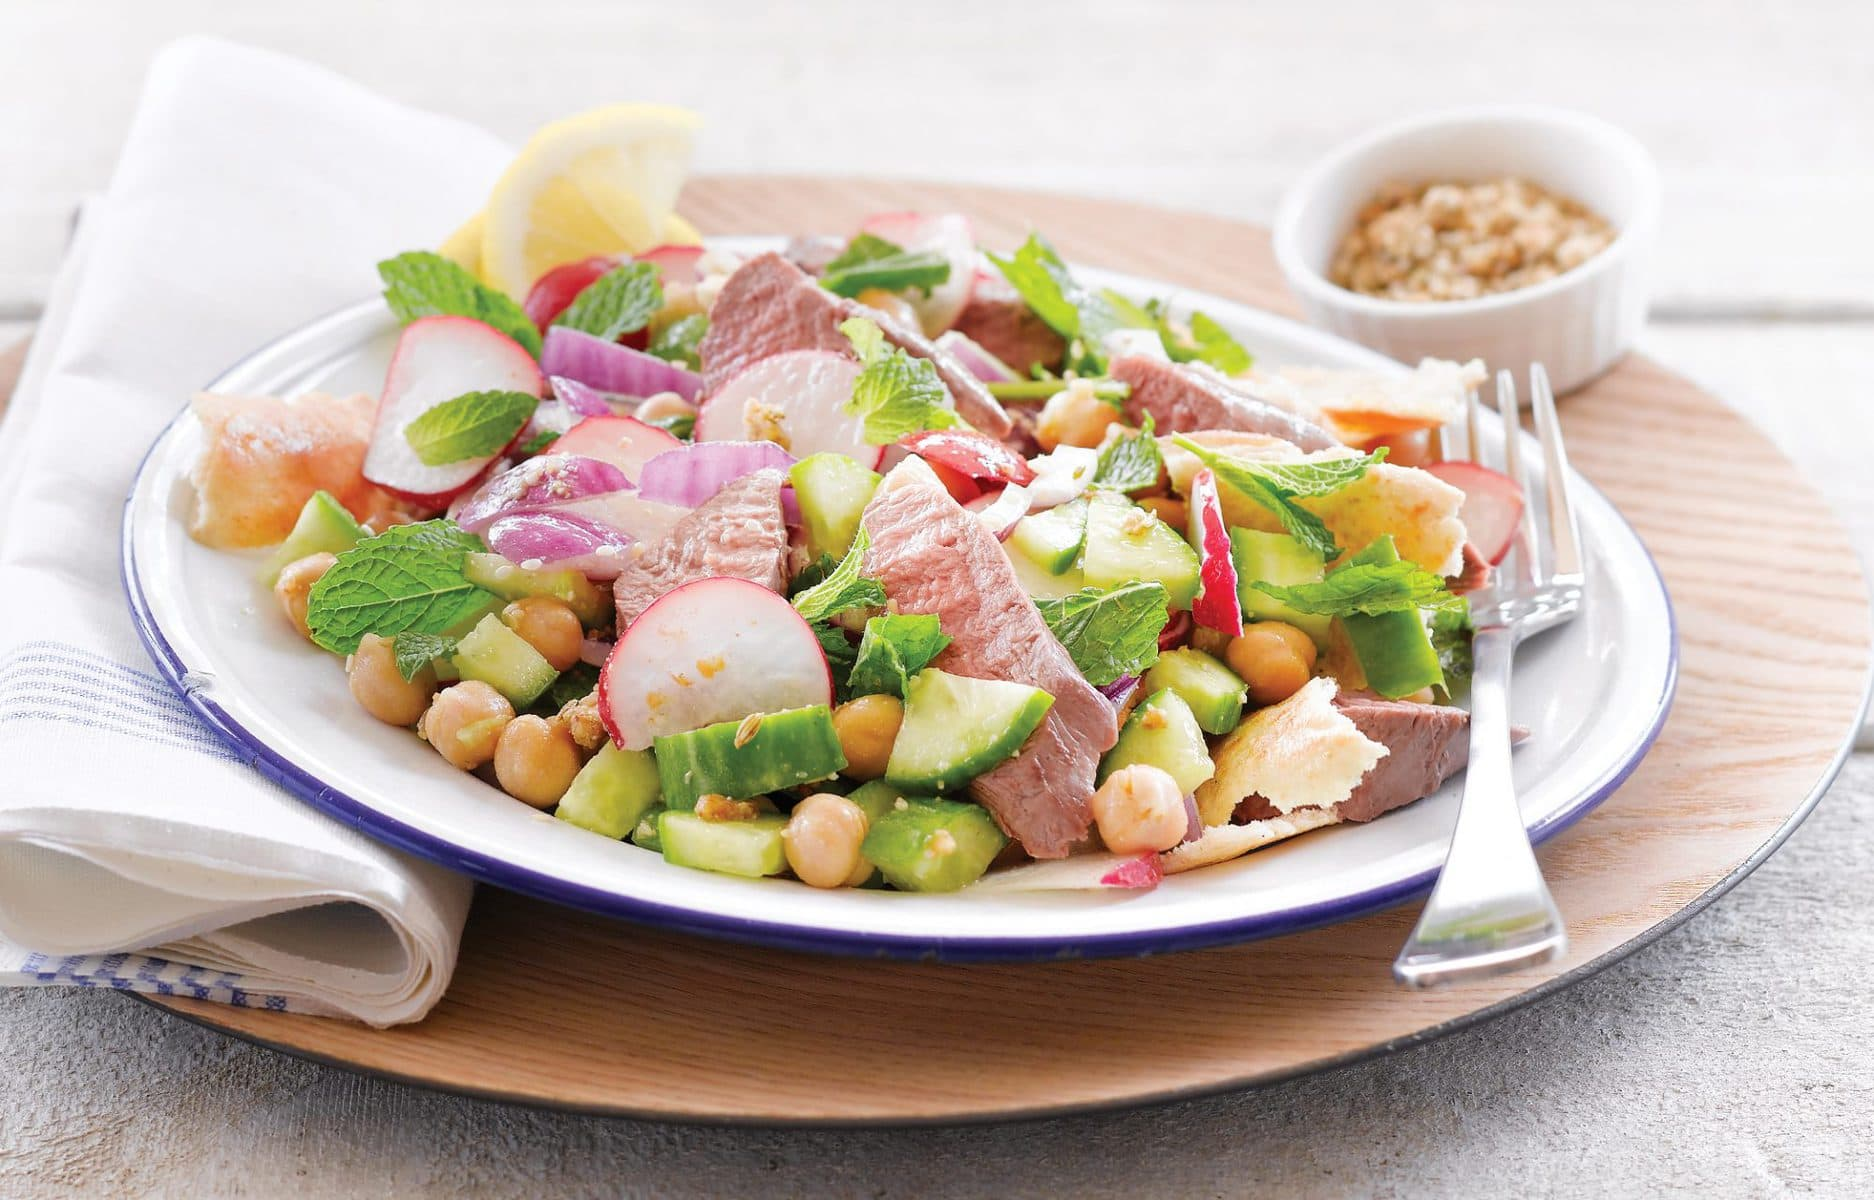 Chickpea and lamb fattoush salad